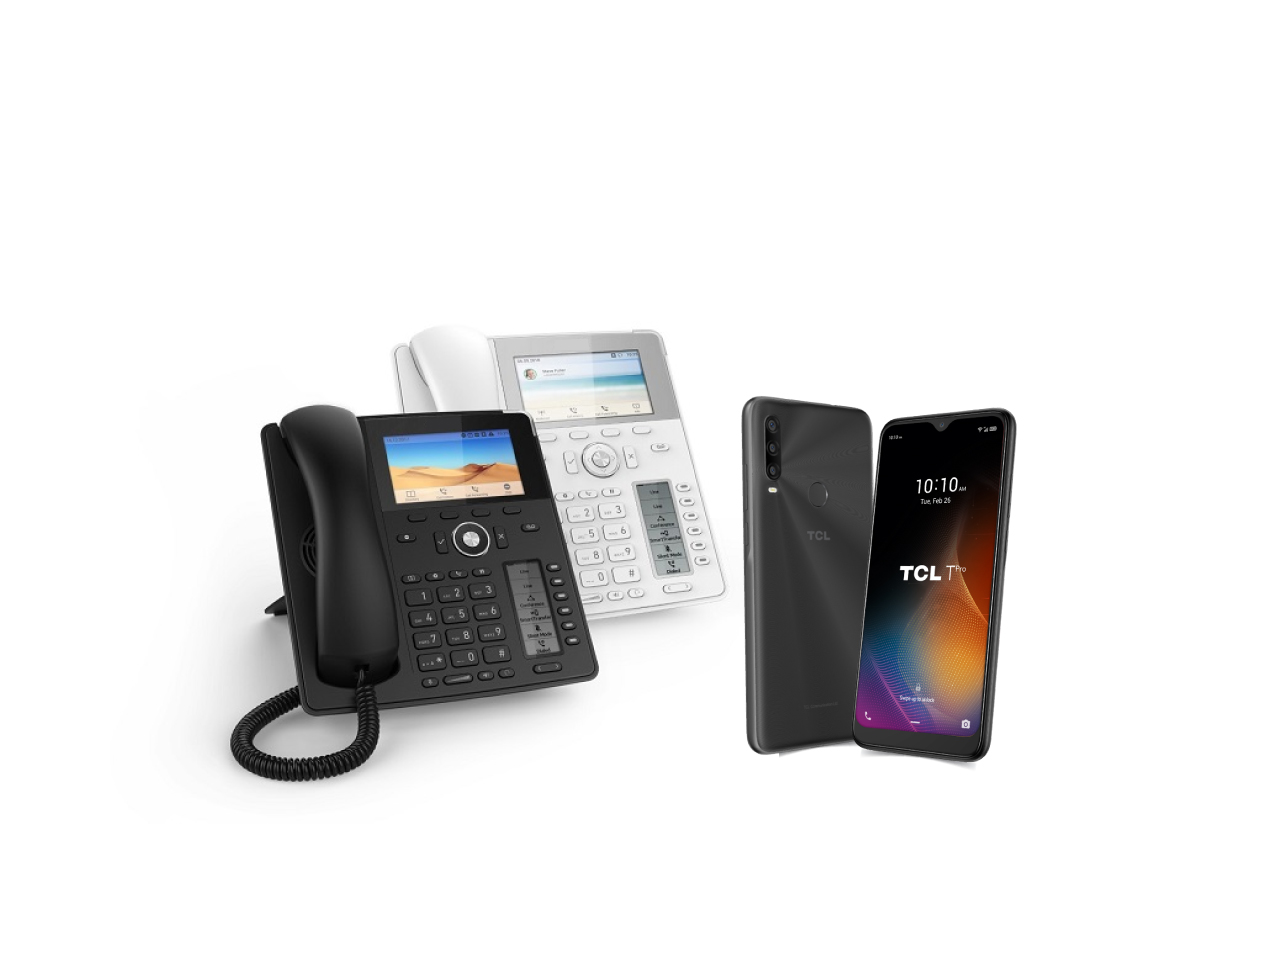 https://grupofixon.com/wp-content/uploads/2021/06/celulares1.jpg